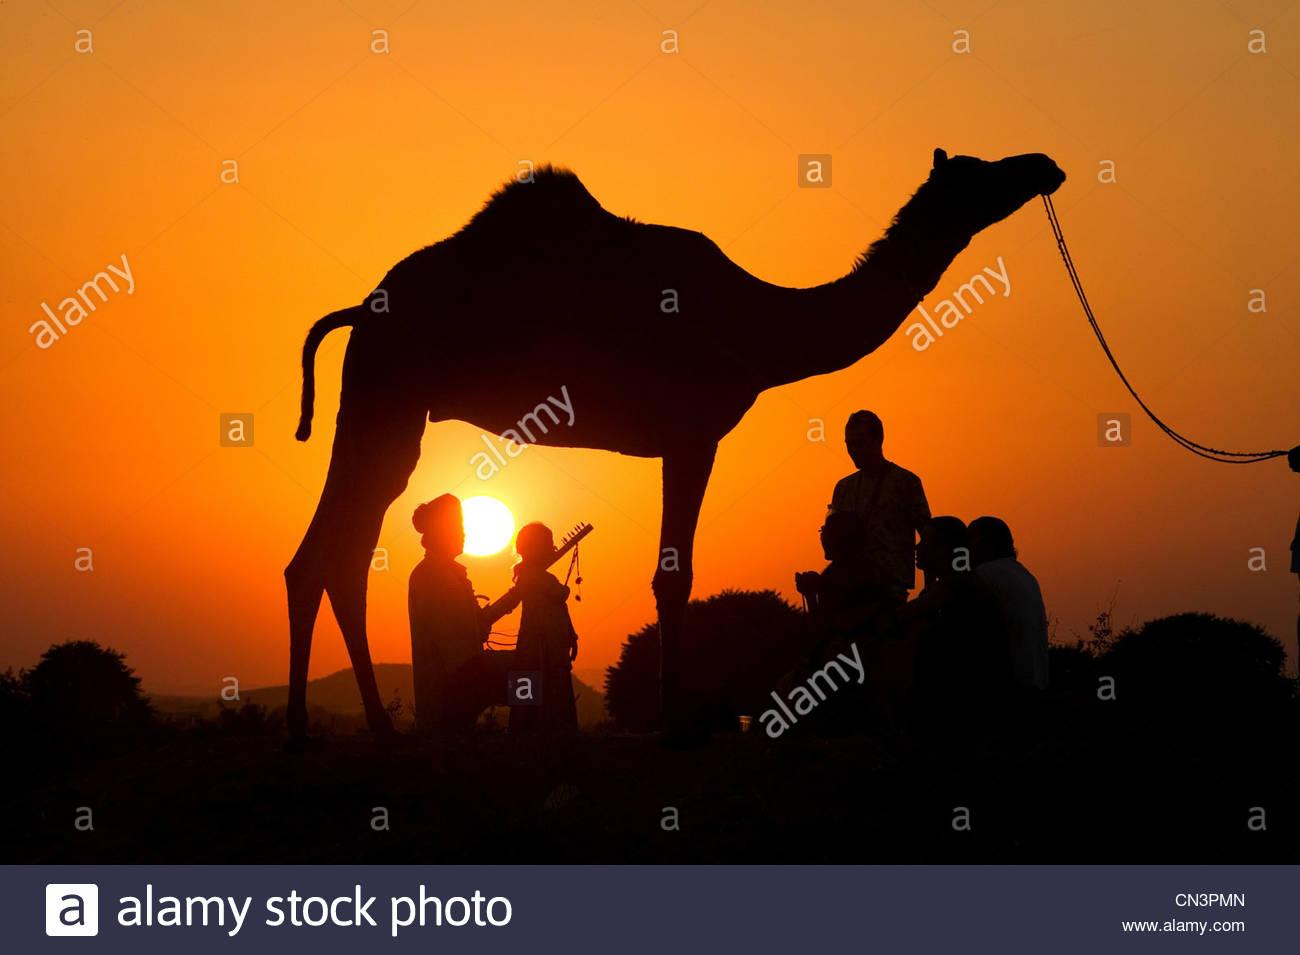 Siluetas de dromedario camello y comerciantes, Feria de camellos de Pushkar, Rajastán, India Imagen De Stock